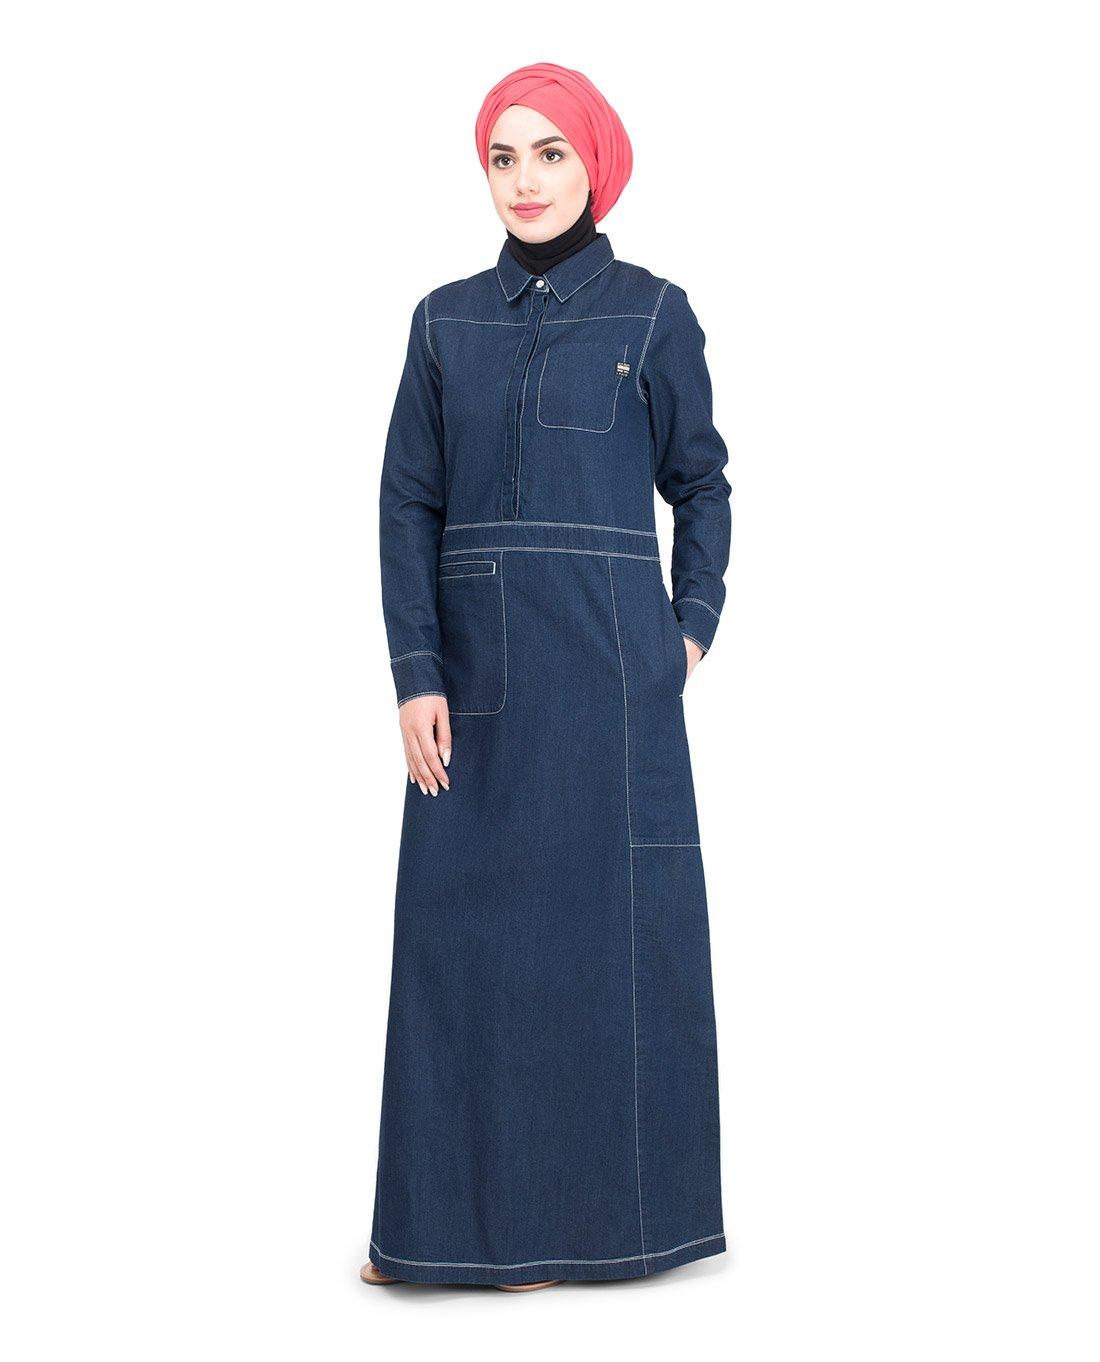 Silk Route Fine Denim Detail Urban Maxi Dress Jilbab Large 54